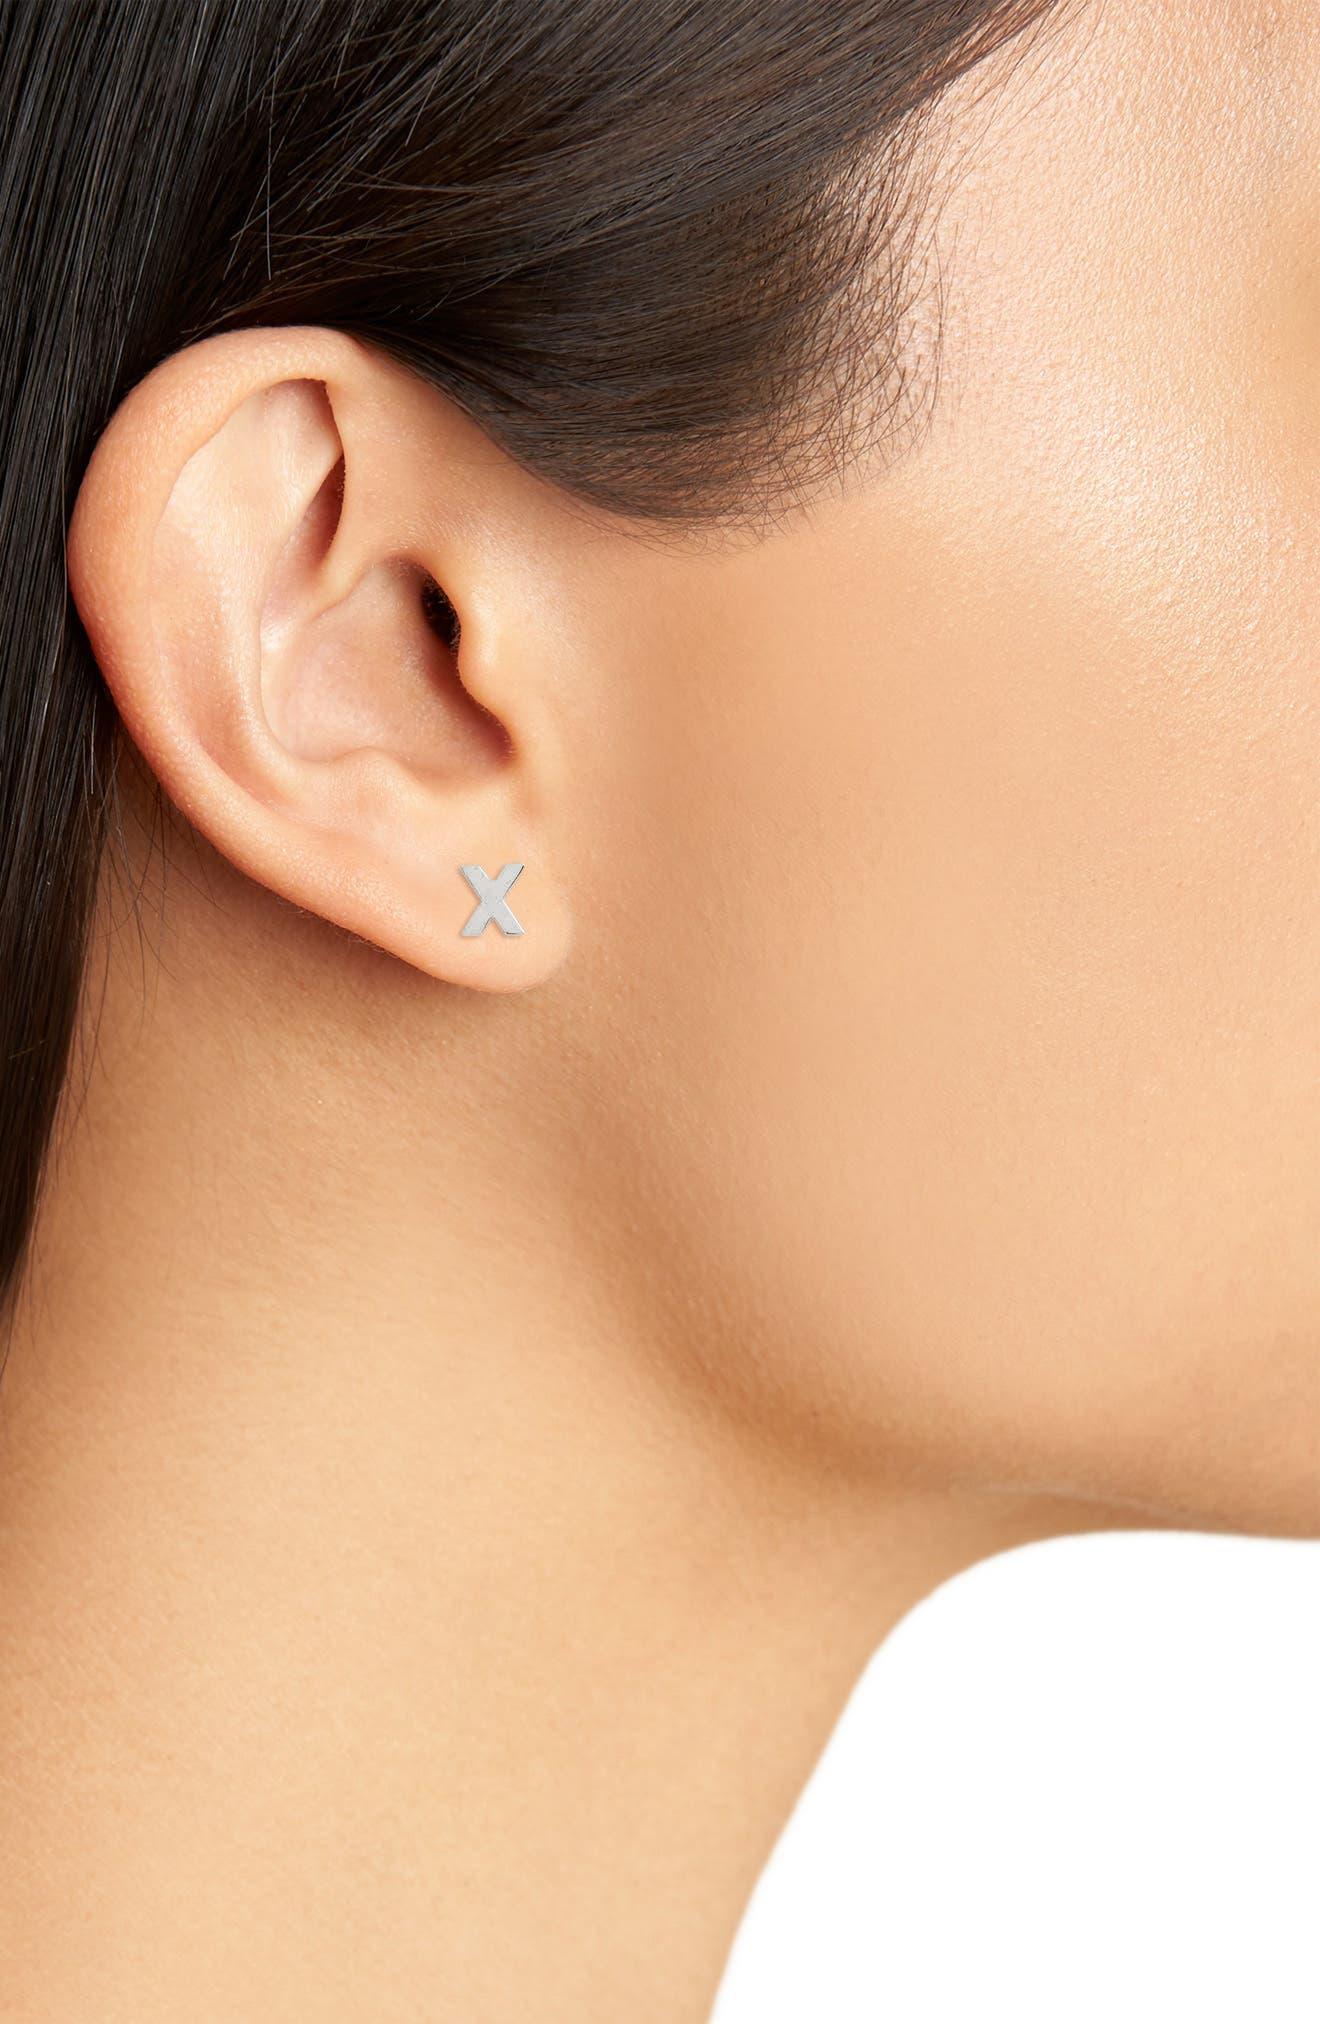 XO Stud Earrings,                             Alternate thumbnail 3, color,                             Silver